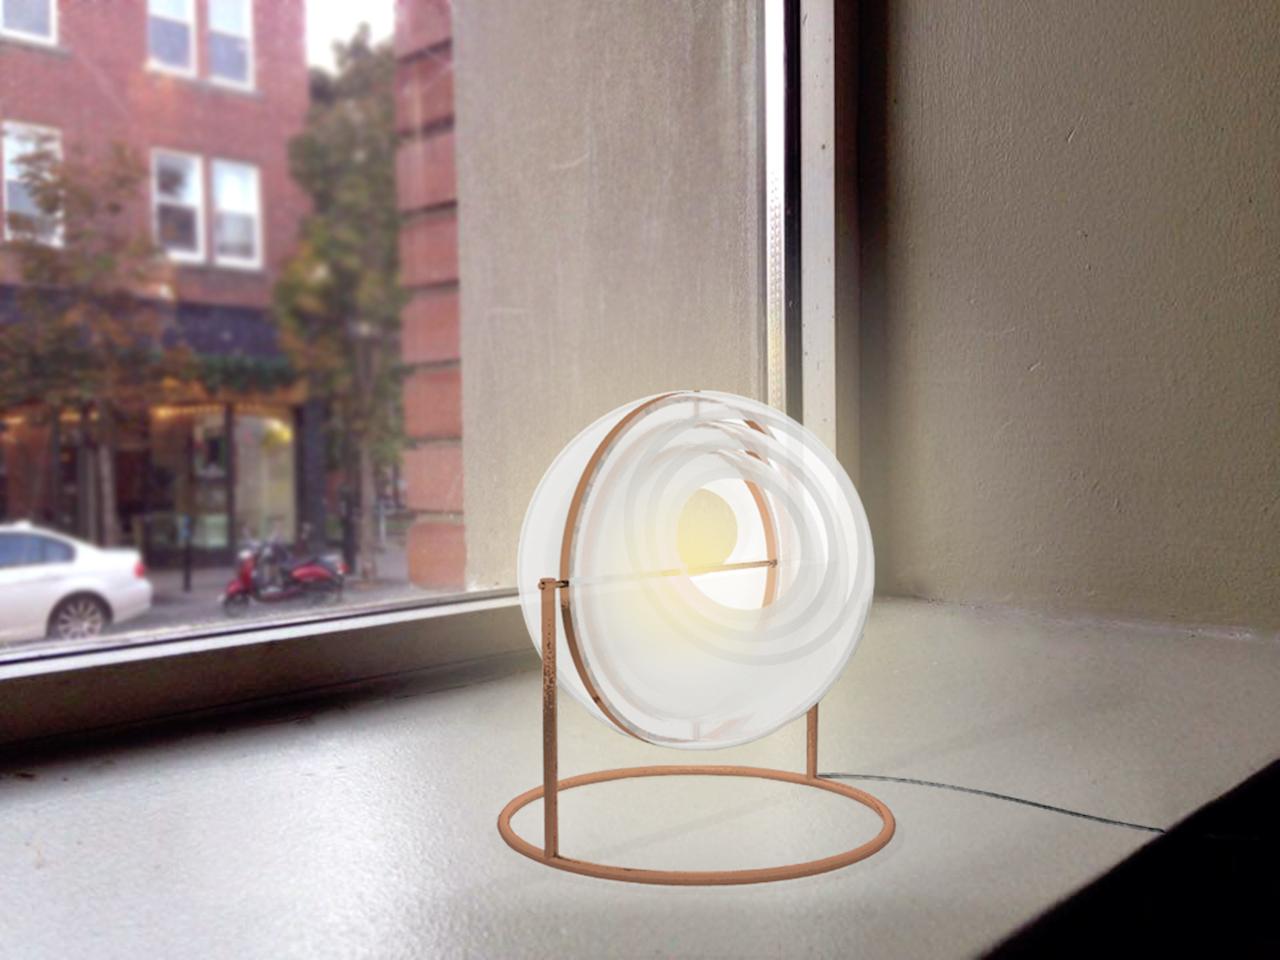 LAMP_Introspection_RachelTardif_Verdun_Quebec.jpg